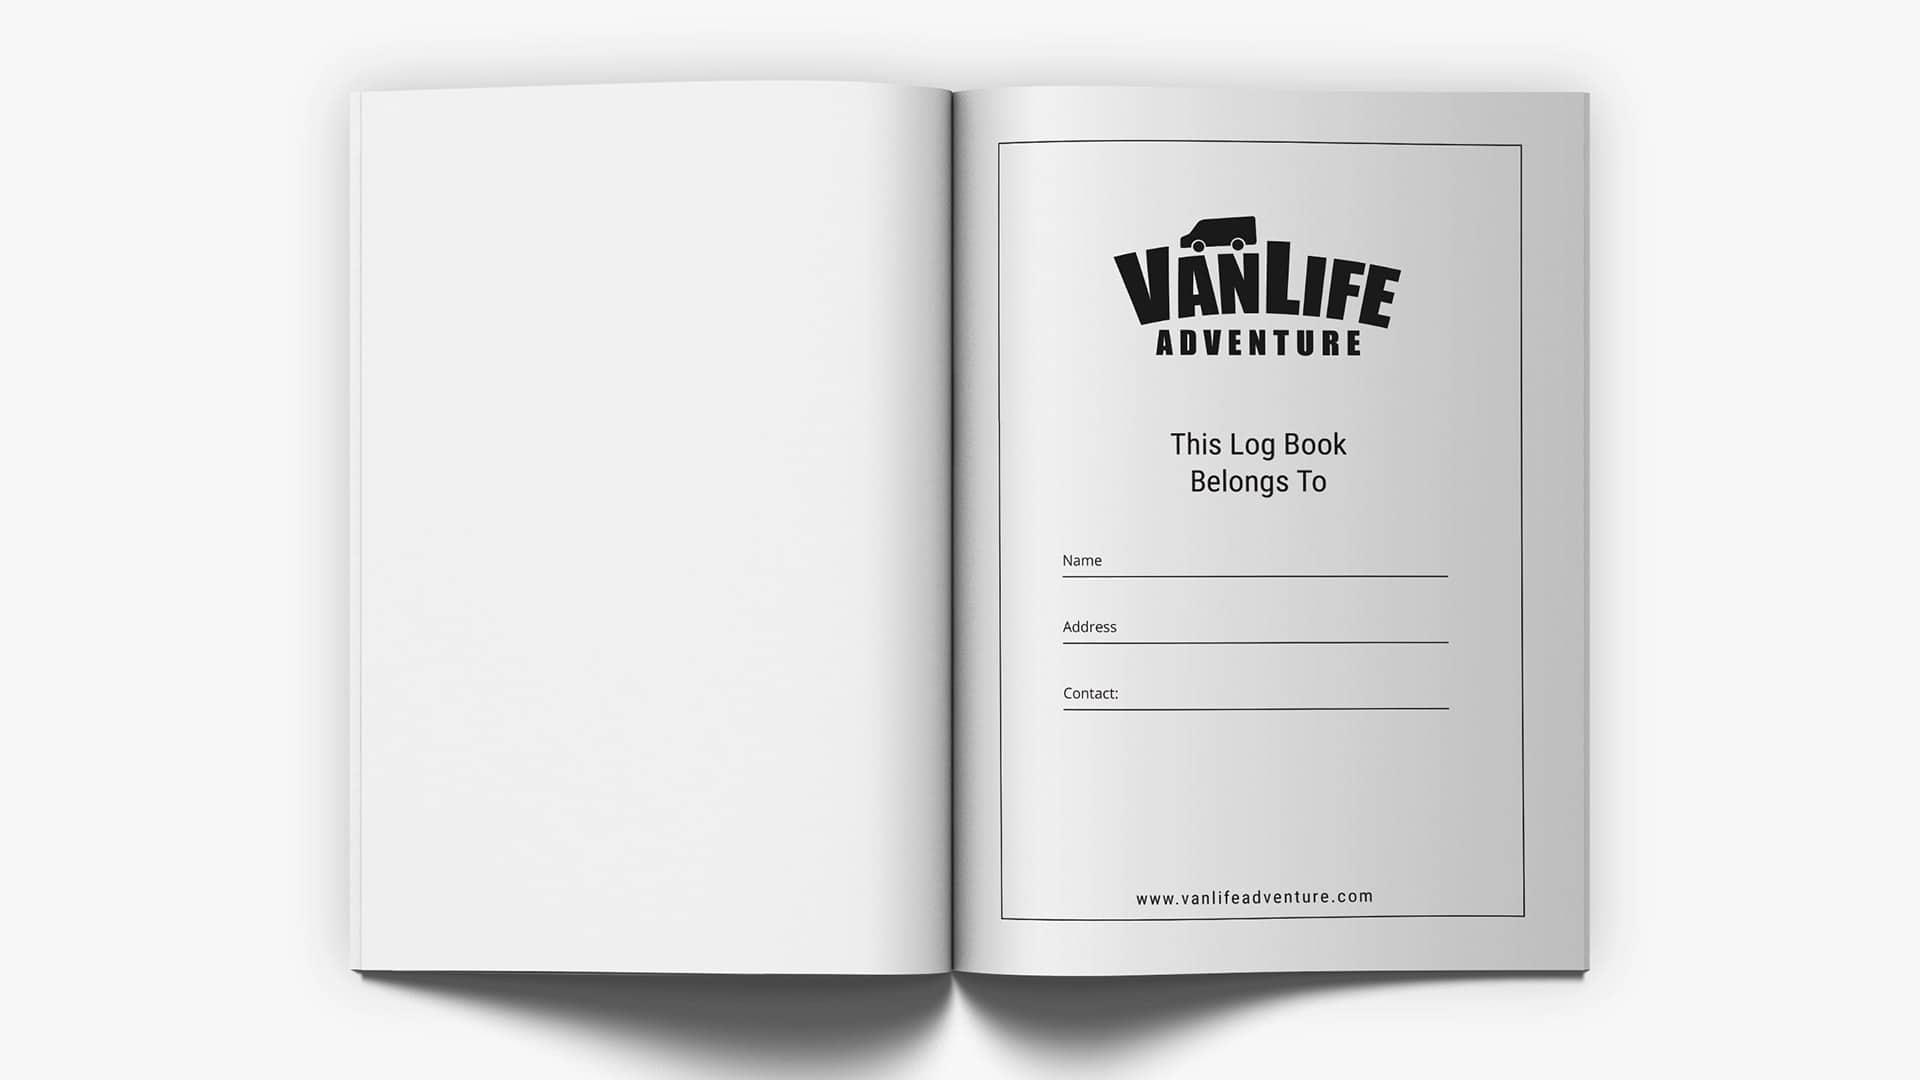 vanlife travel log campervan book journal 5